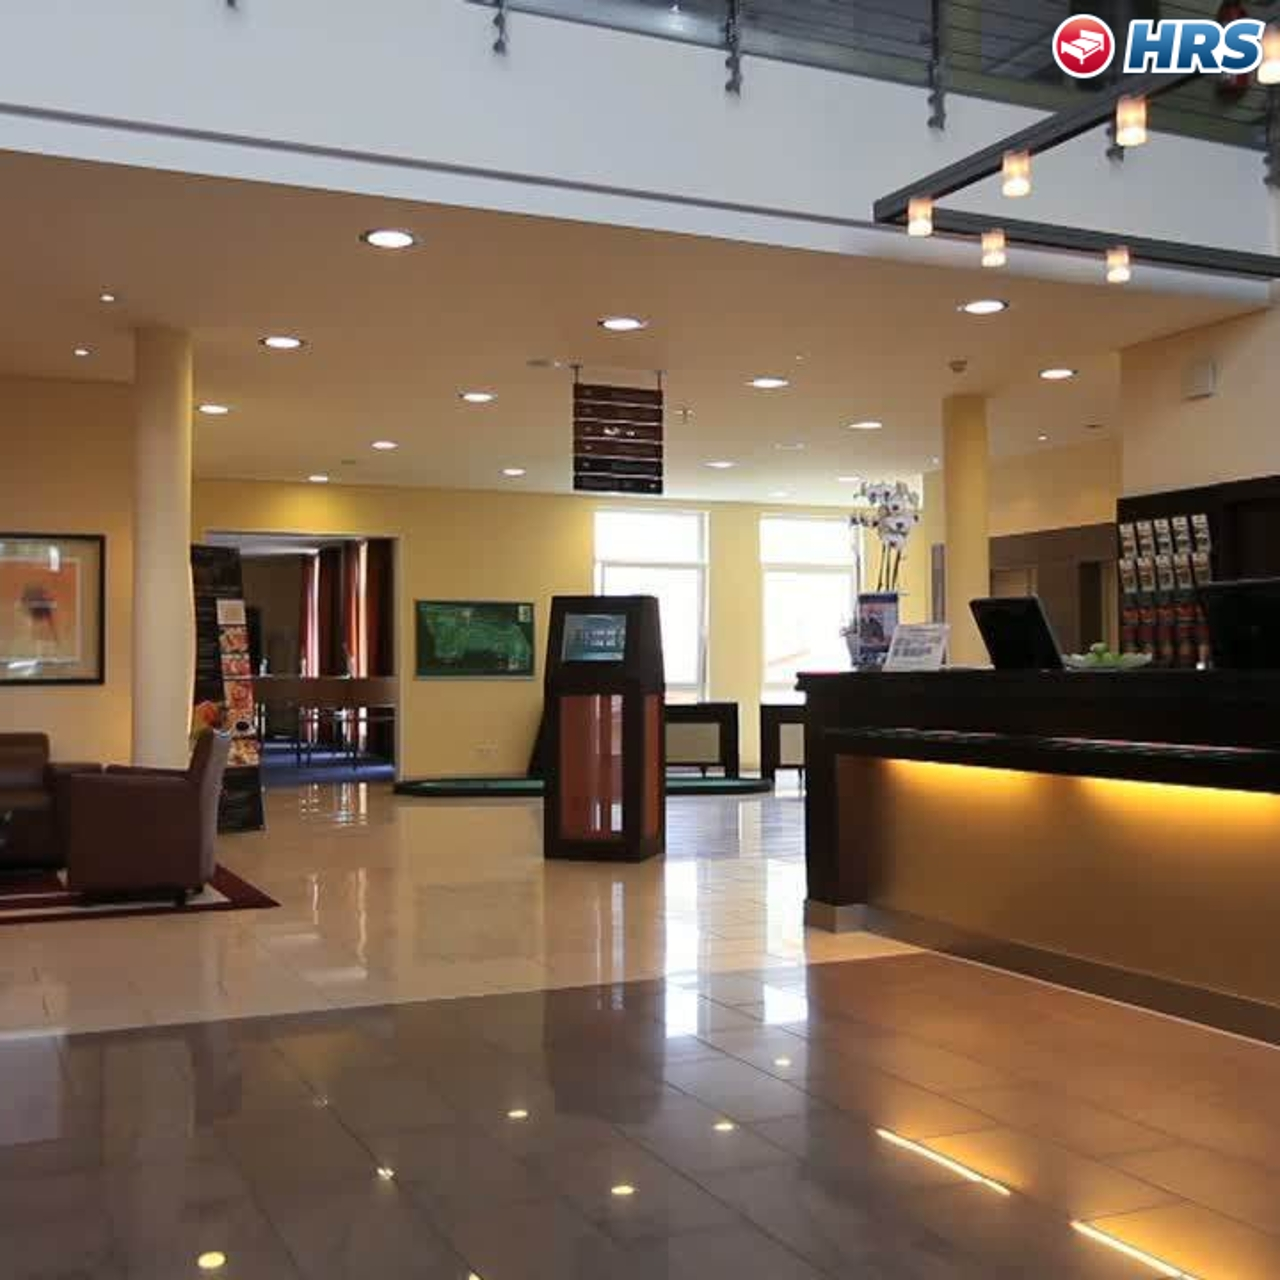 Hotel Best Western Premier Castanea Resort 4 Hrs Star Hotel In Adendorf Lower Saxony